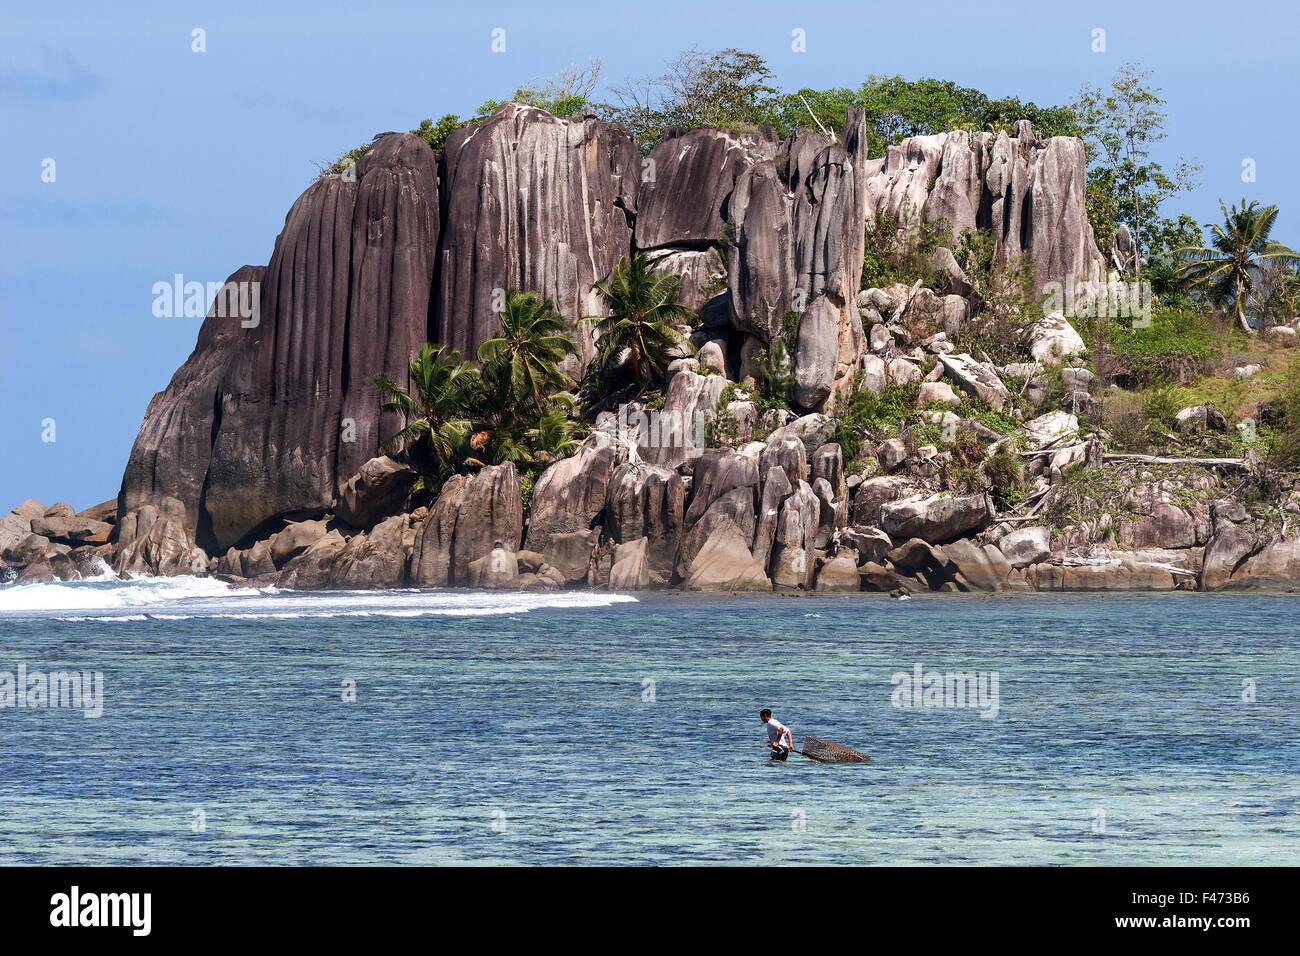 Seychelles Tropical Fish Stock Photos & Seychelles ...